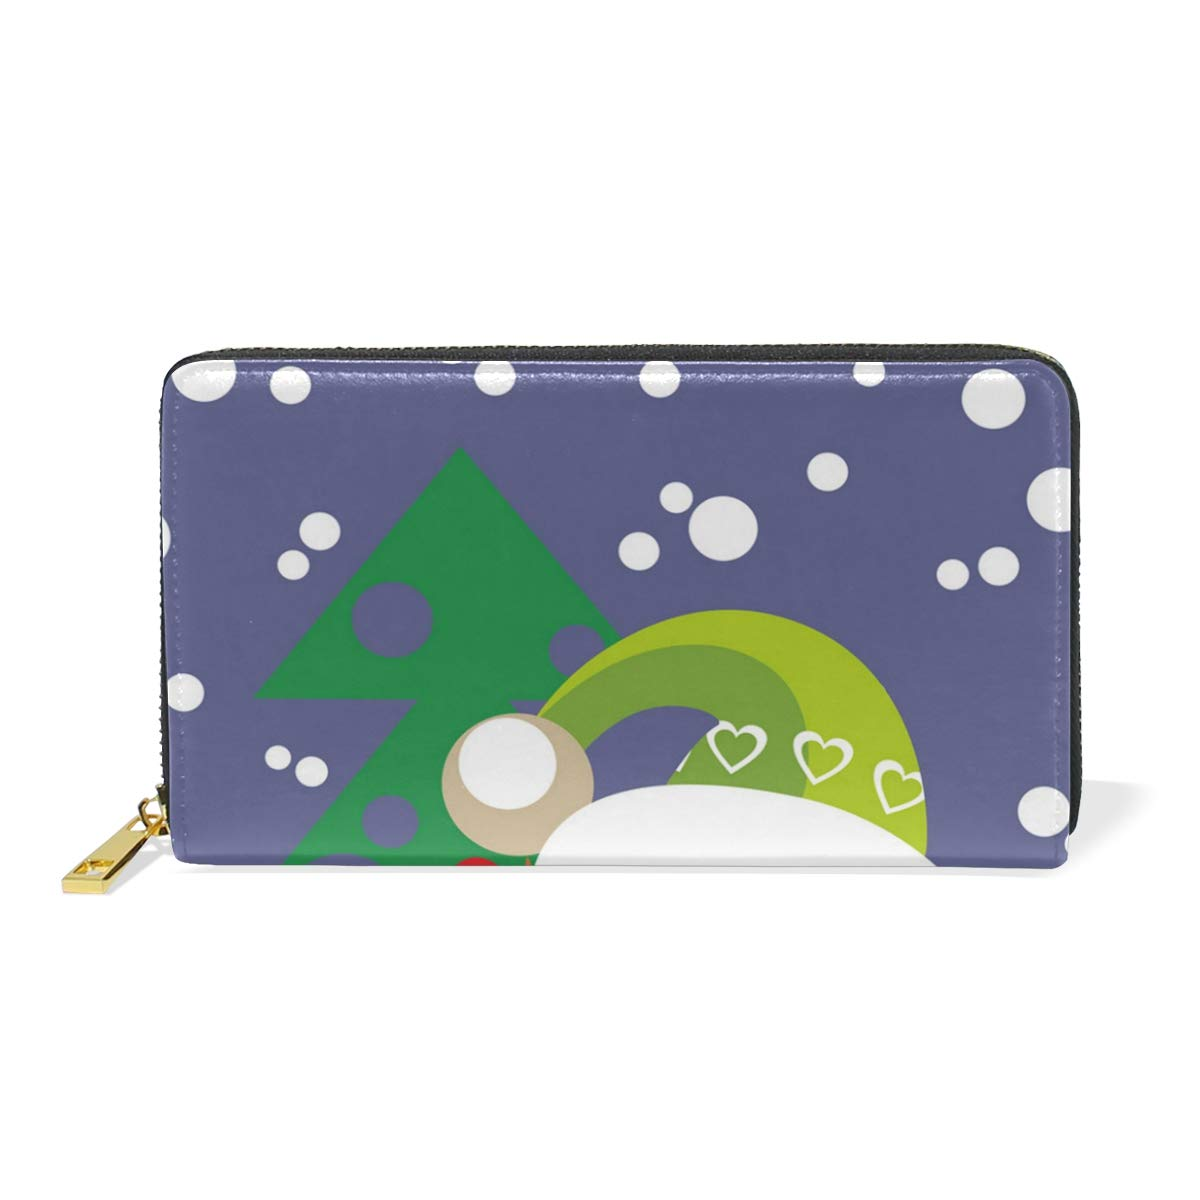 Artificial Christmas Tree Snowman Real Leather Zip Around Wallet Wristlet minimalist wallet Travel Purse Wristlet